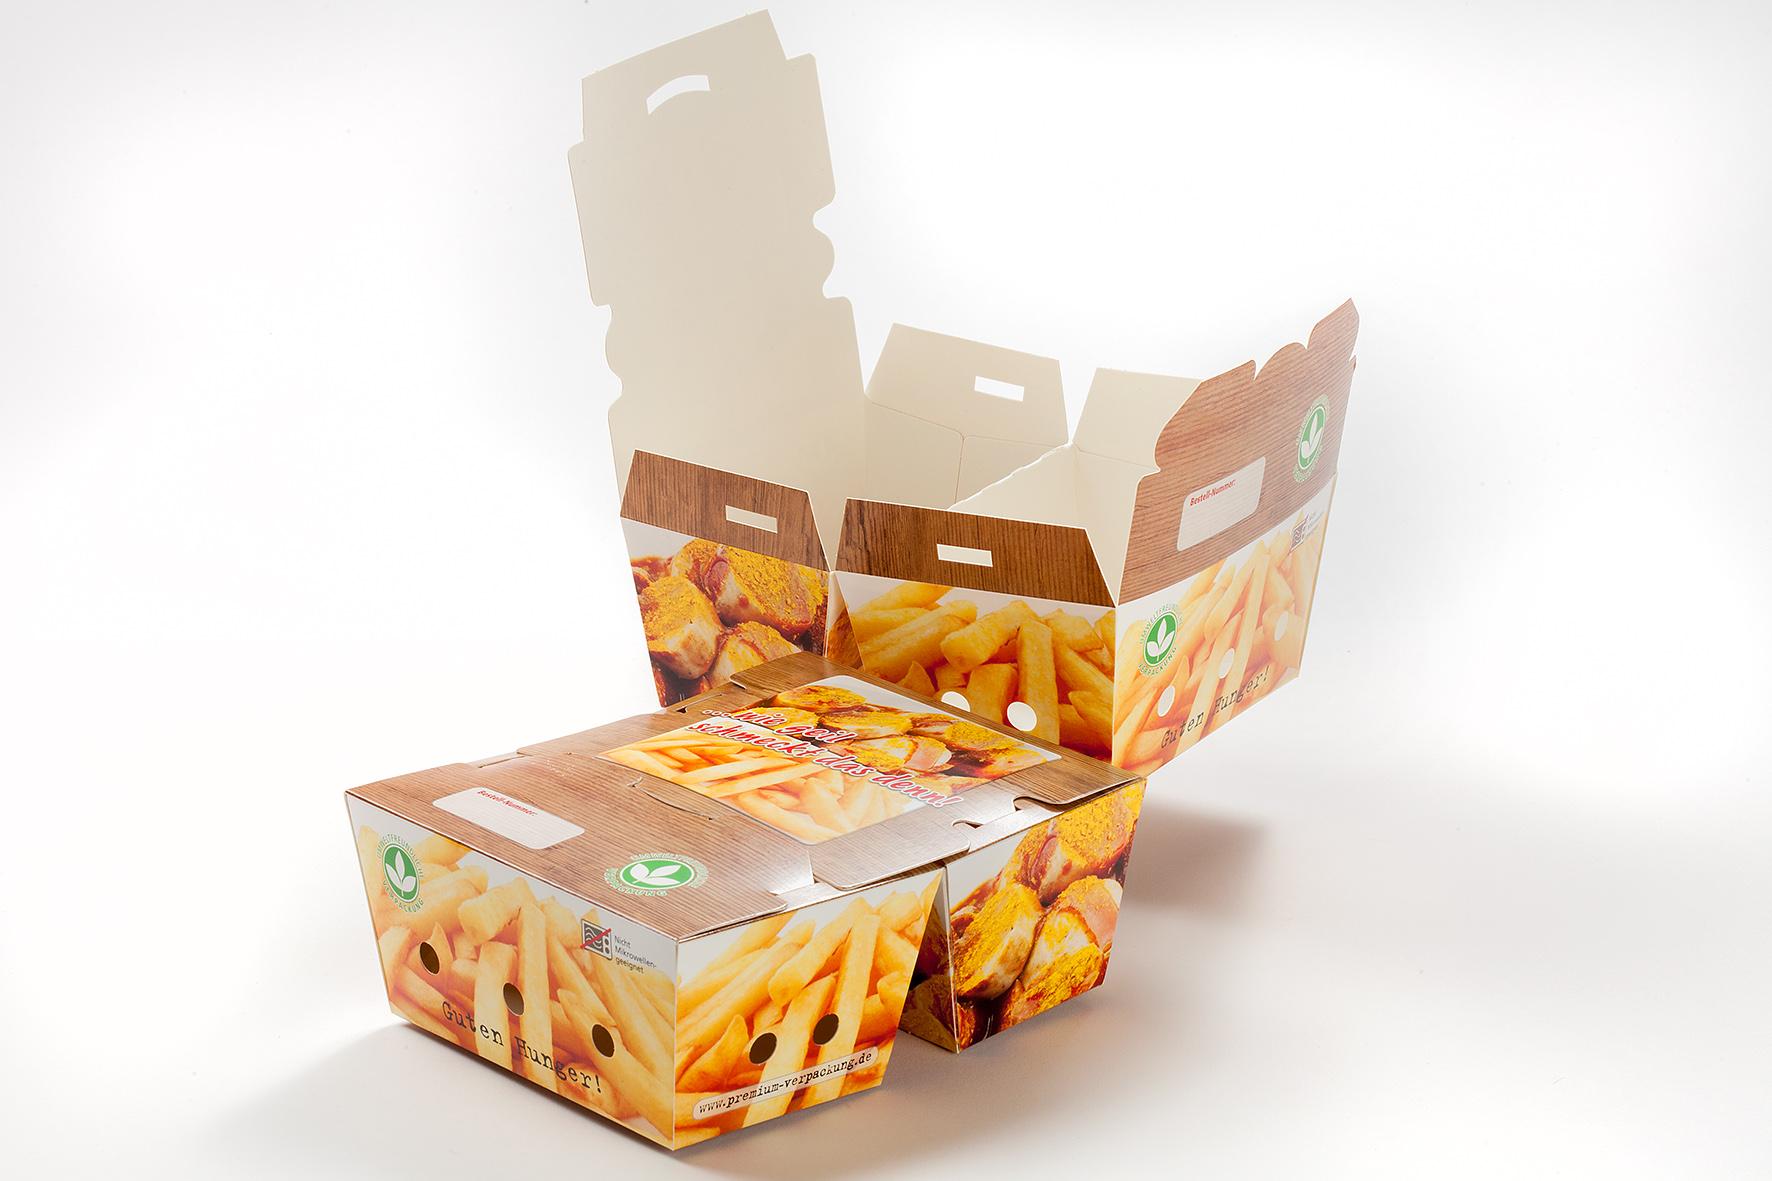 carton-award-image 140512